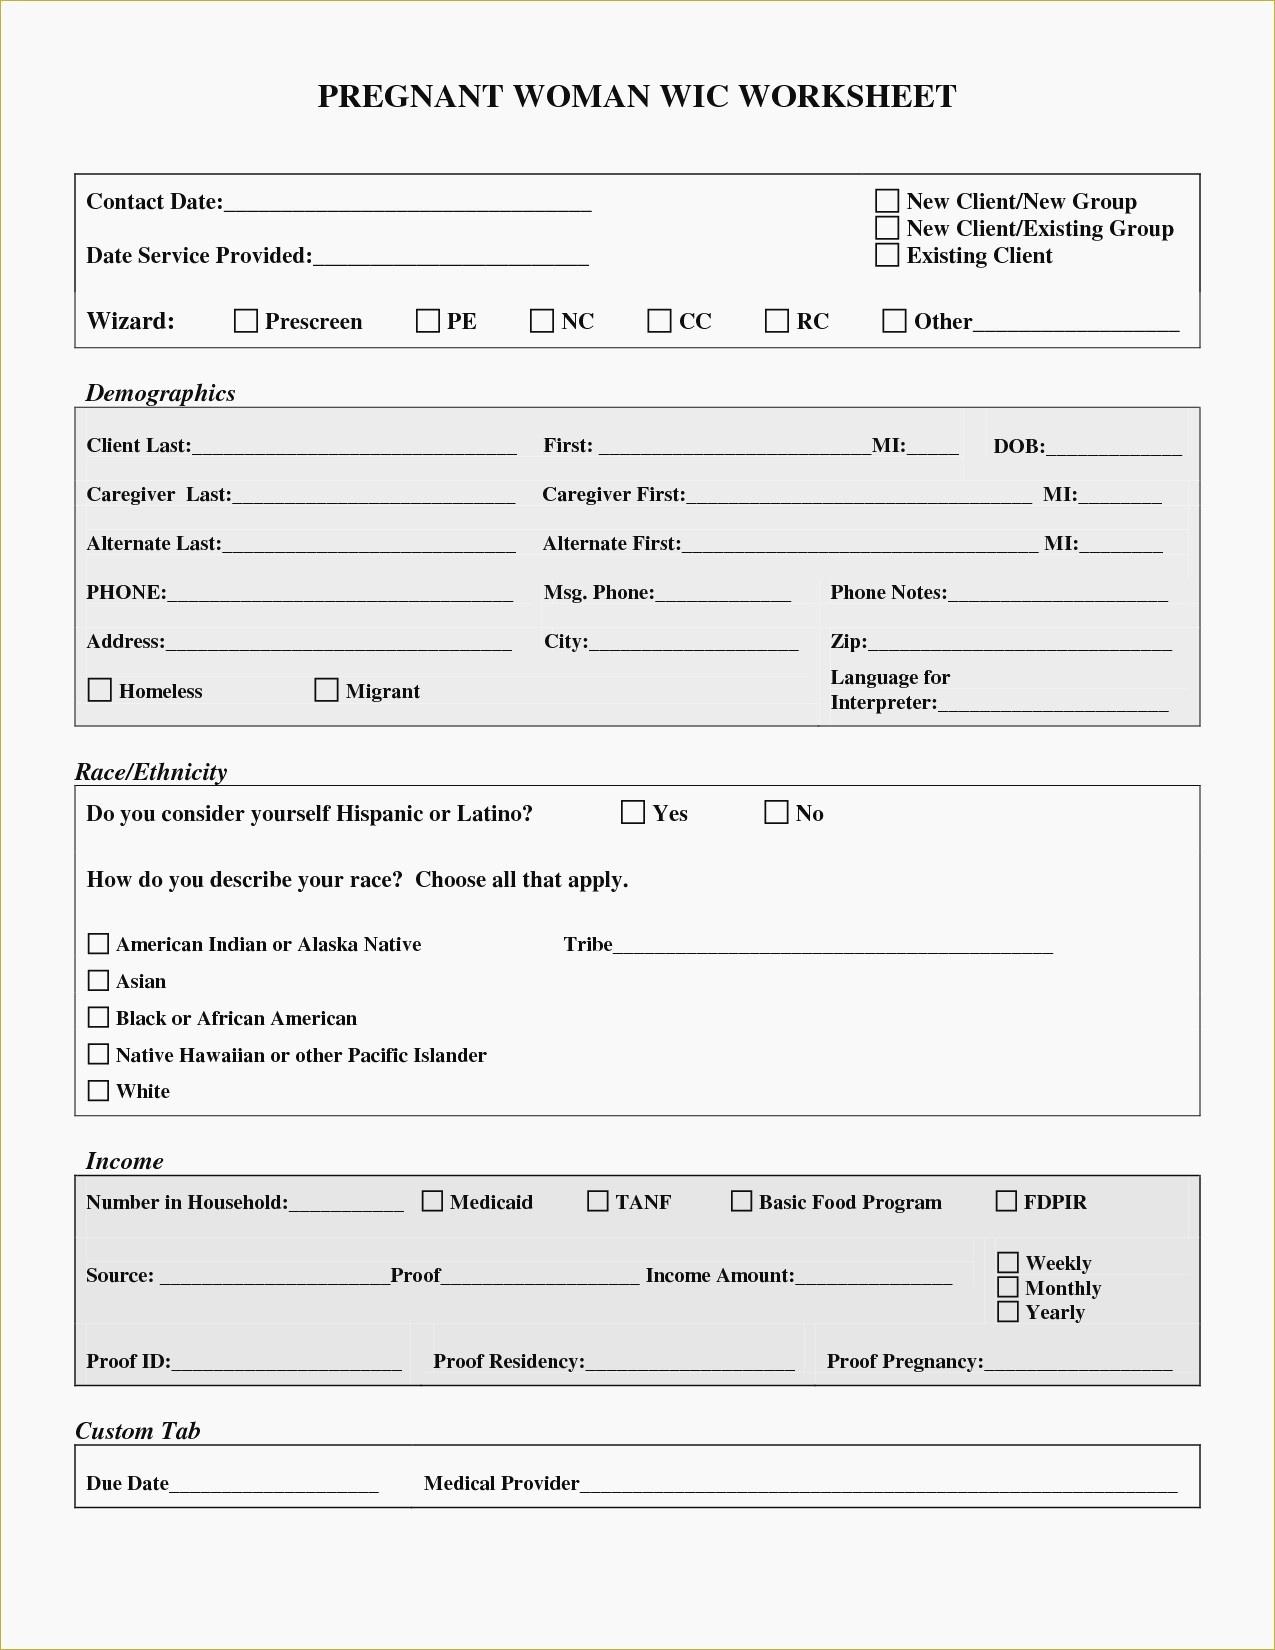 Fake Divorce Papers New Free Printable Fake Pregnancy Papers - Free Printable Divorce Papers